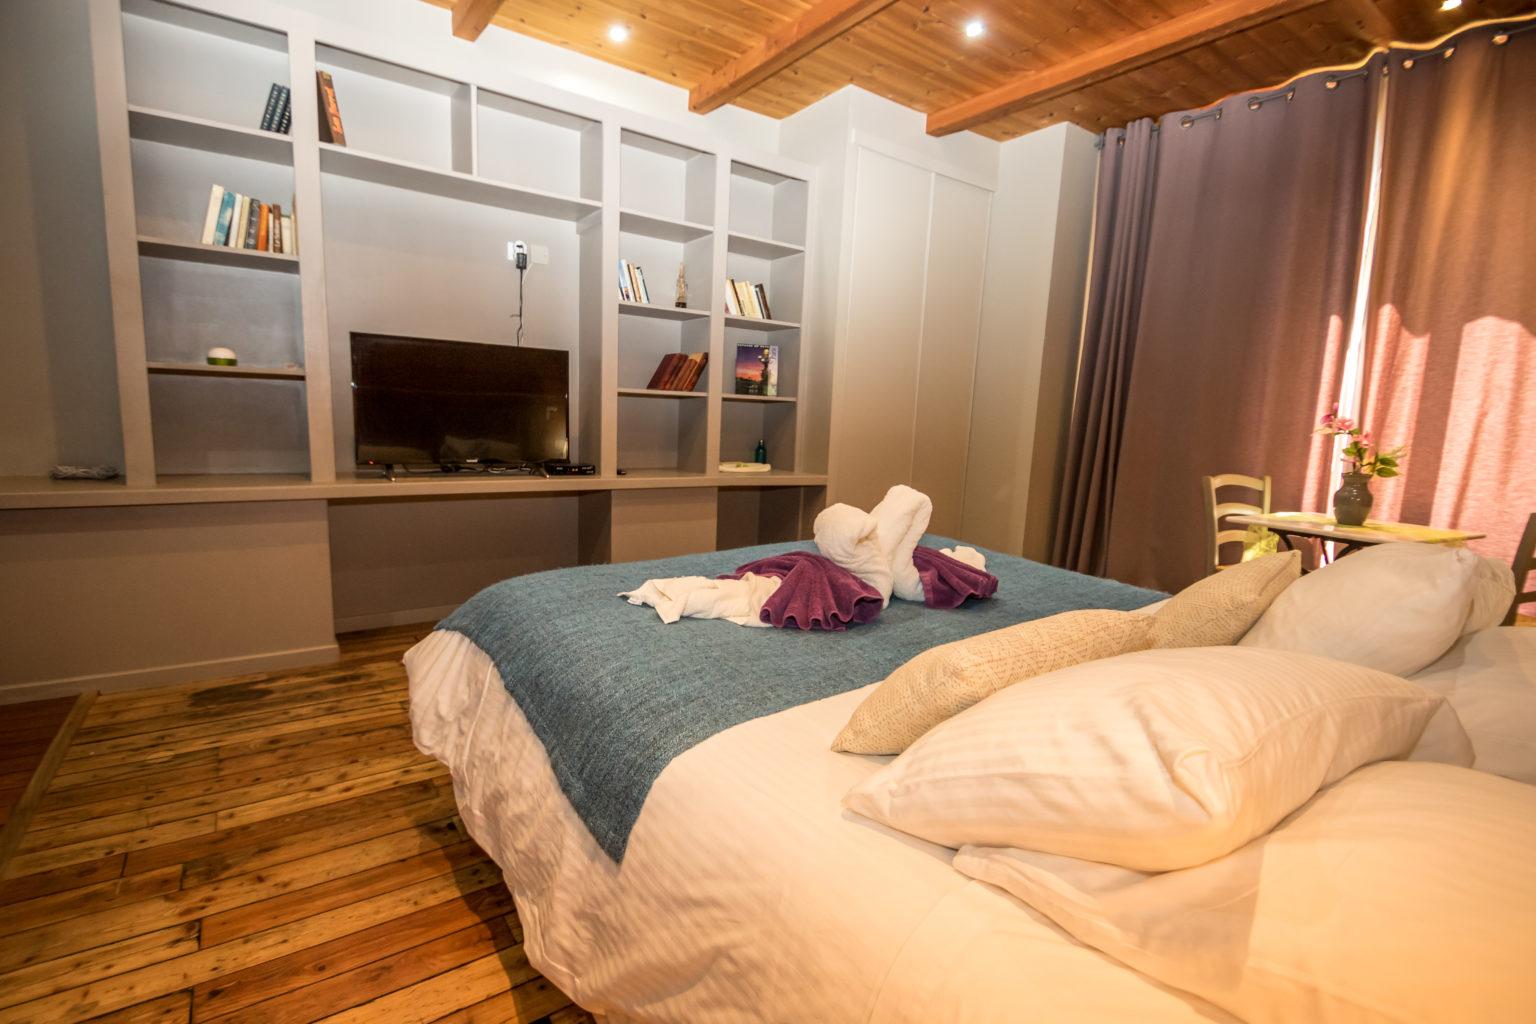 LA FONT VINEUSE HOTEL & SPA - HEBERGEMENT CHARME & INSOLITE 2019-0037LA FONT VINEUSE HOTEL & SPA